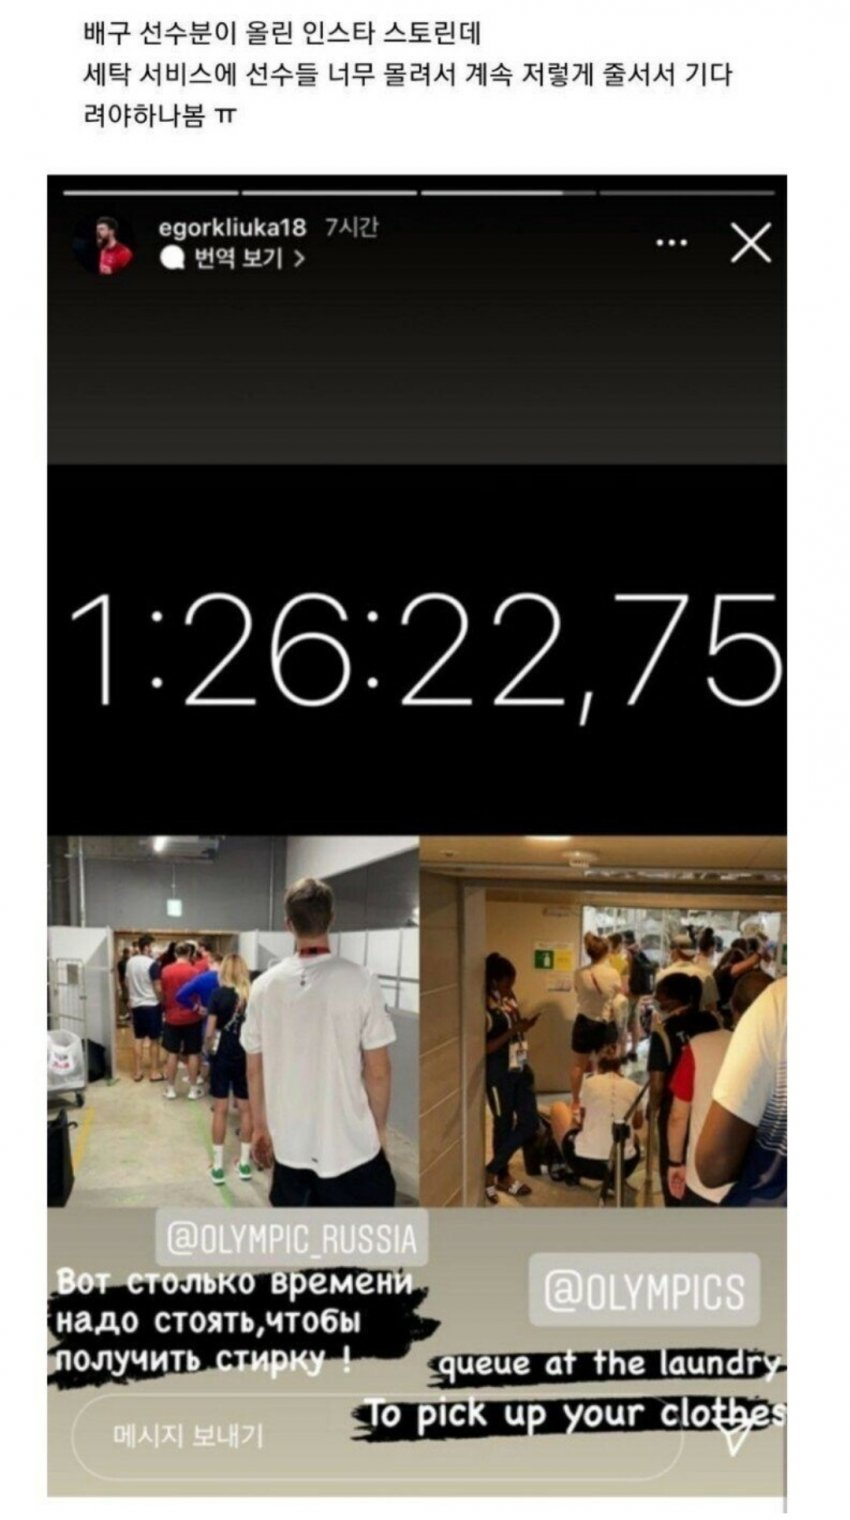 viewimage.php?id=2fbcc323e7d334aa51b1d3a24781&no=24b0d769e1d32ca73feb86fa11d02831b7cca0f2855e21730c724febbe066d518608b4eb652e6b47072c8dc0c911d1c05cd25af829cff6768232aefeafa9c2300ab2ae1df95a5a49d45a2fdb7abb0f47ad35bfca93560d96647b89949a79b11ac44847d5c76db5ce82fedd